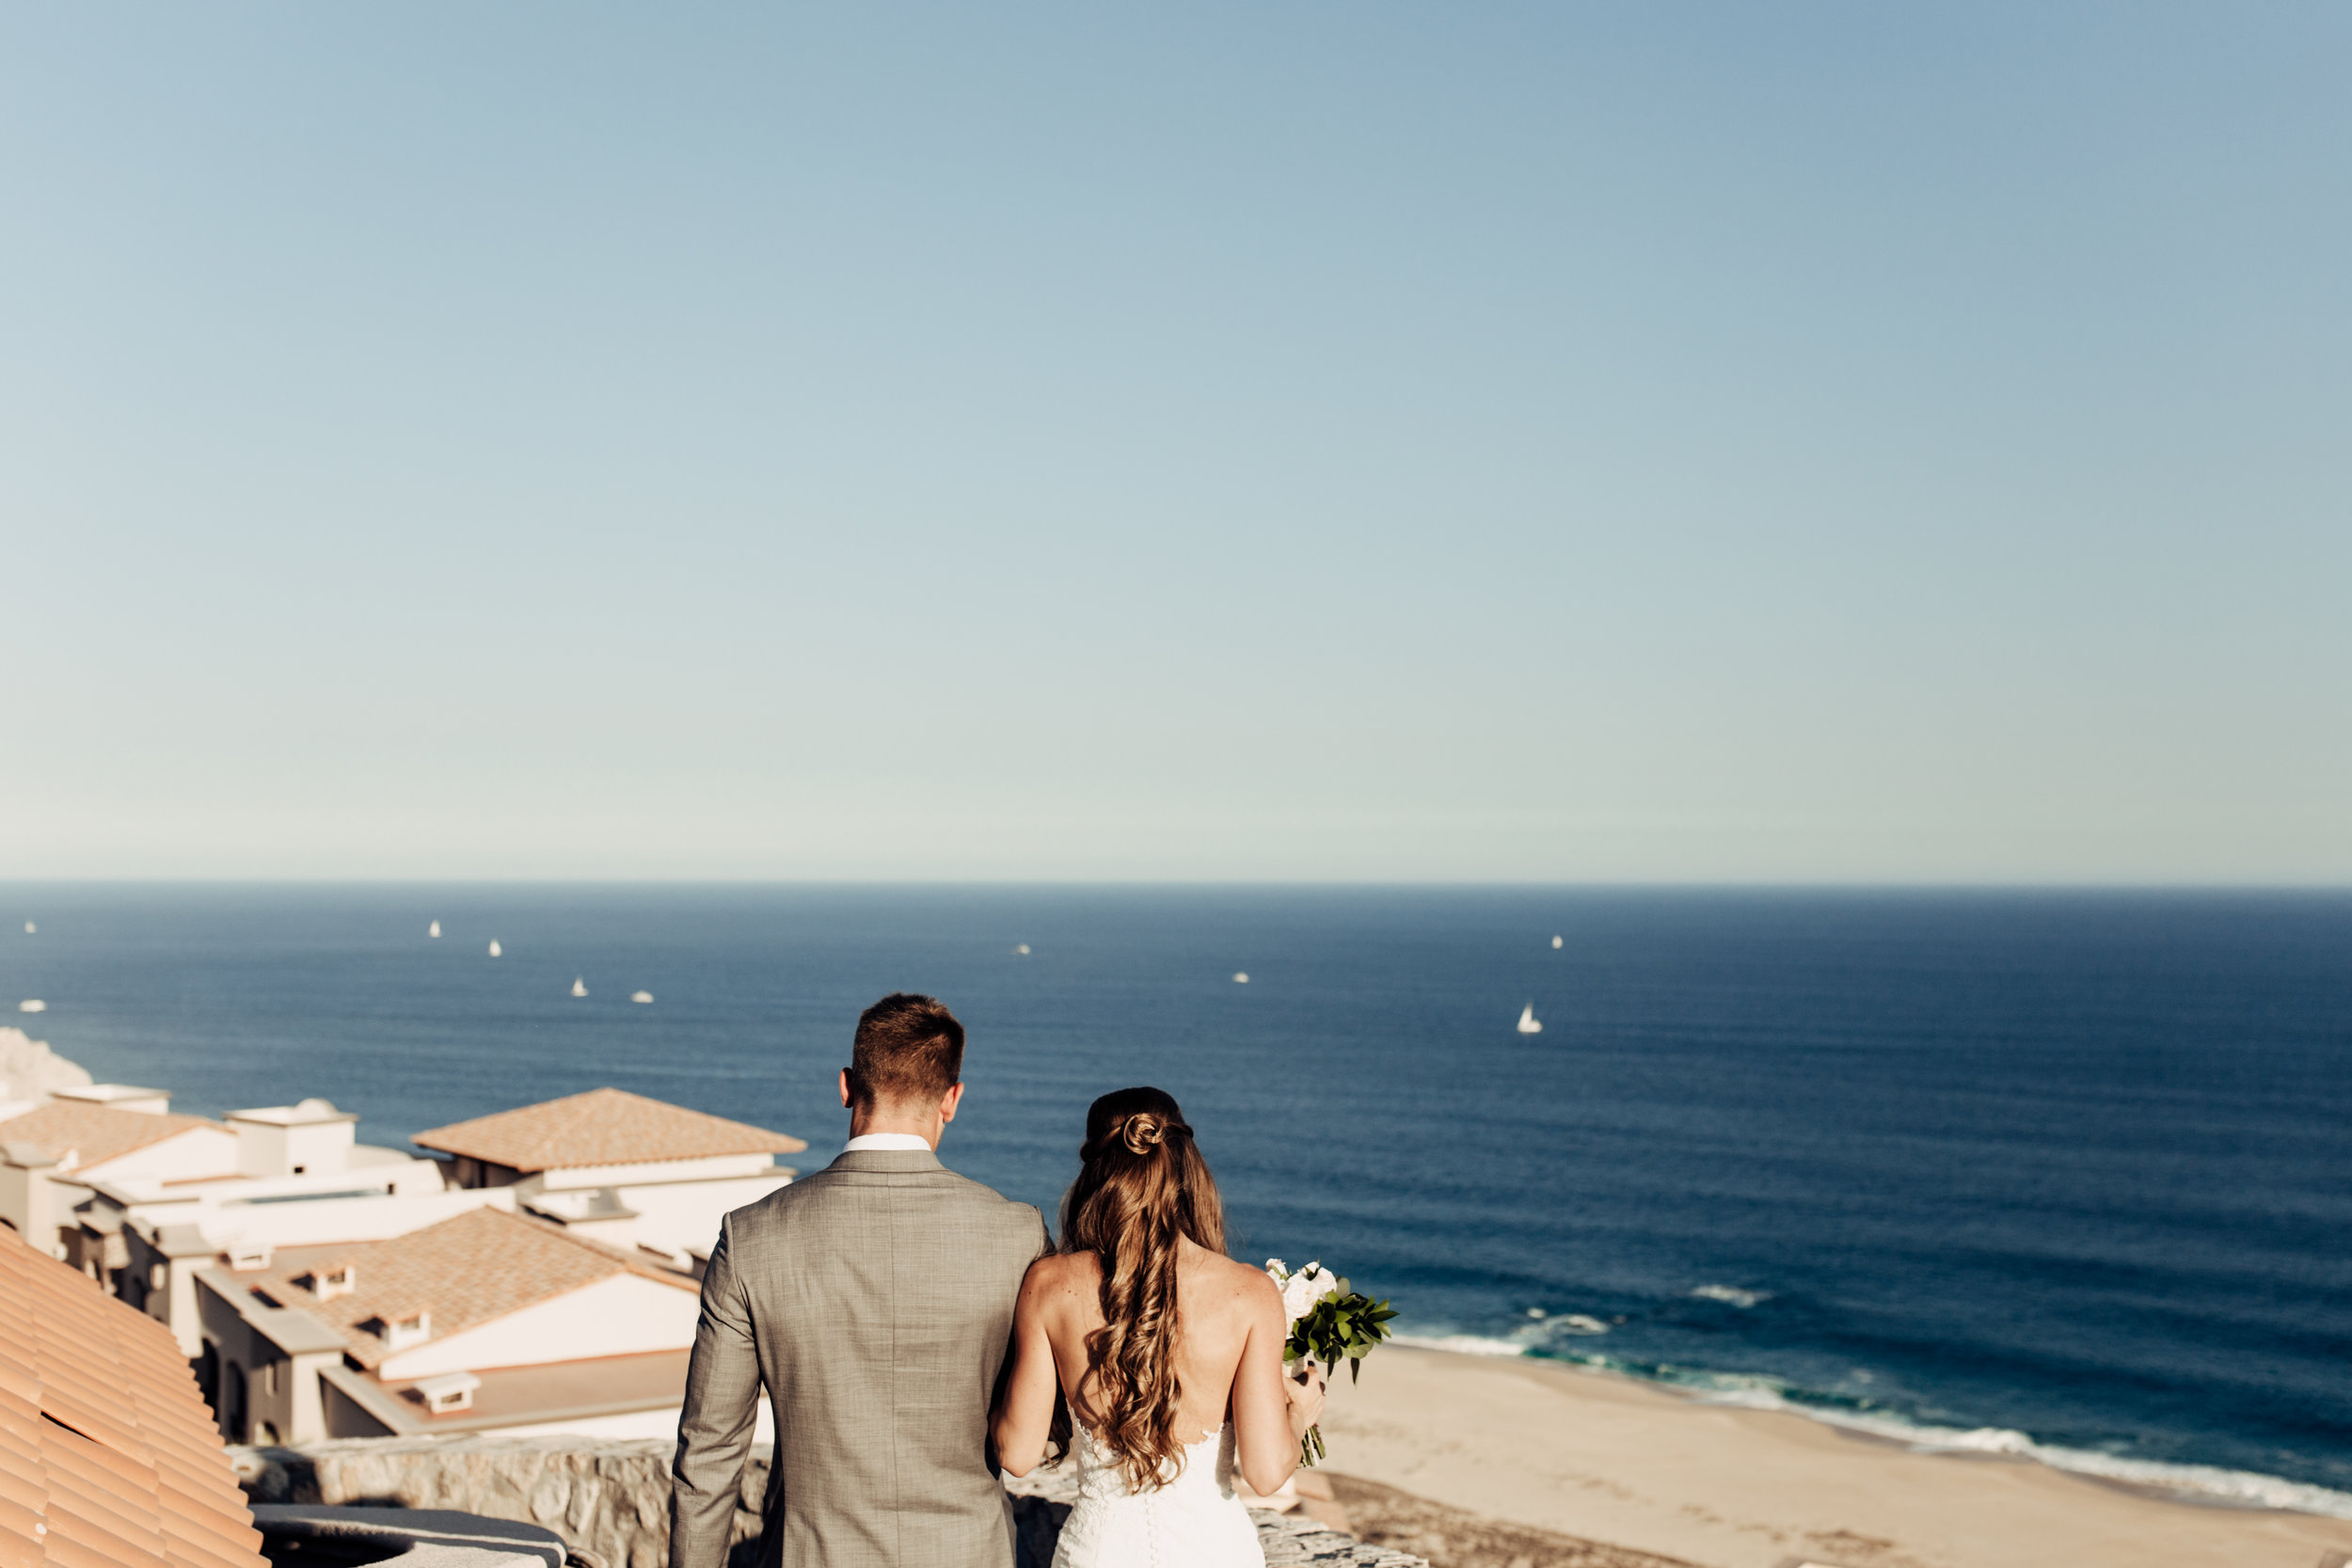 pueblo-bonito-sunset-beach-wedding-cabo-san-lucas350.jpg